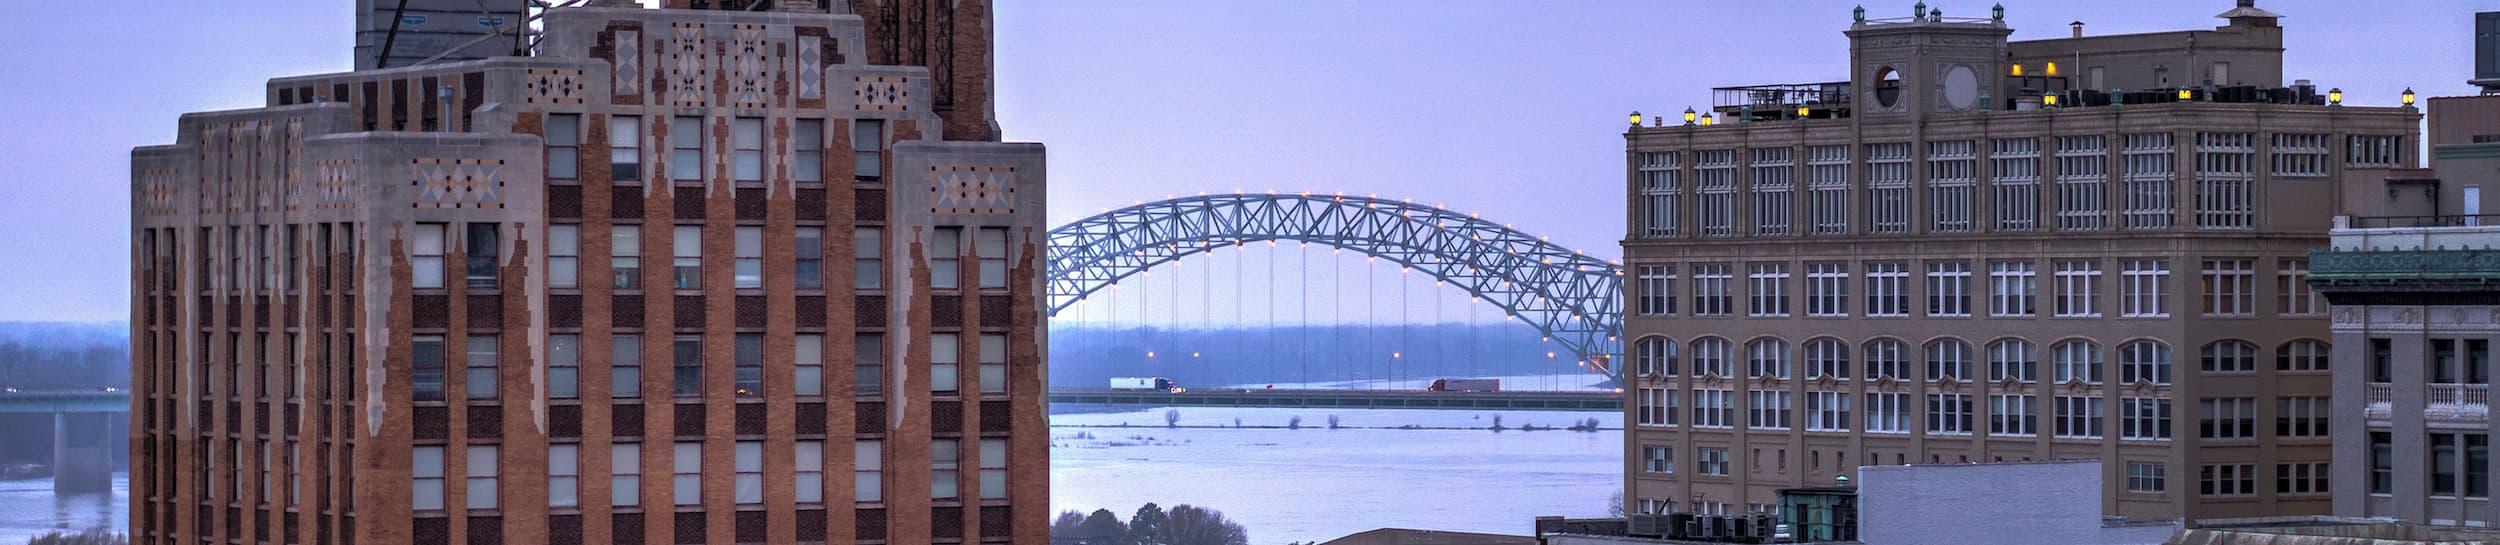 Skyline of Memphis